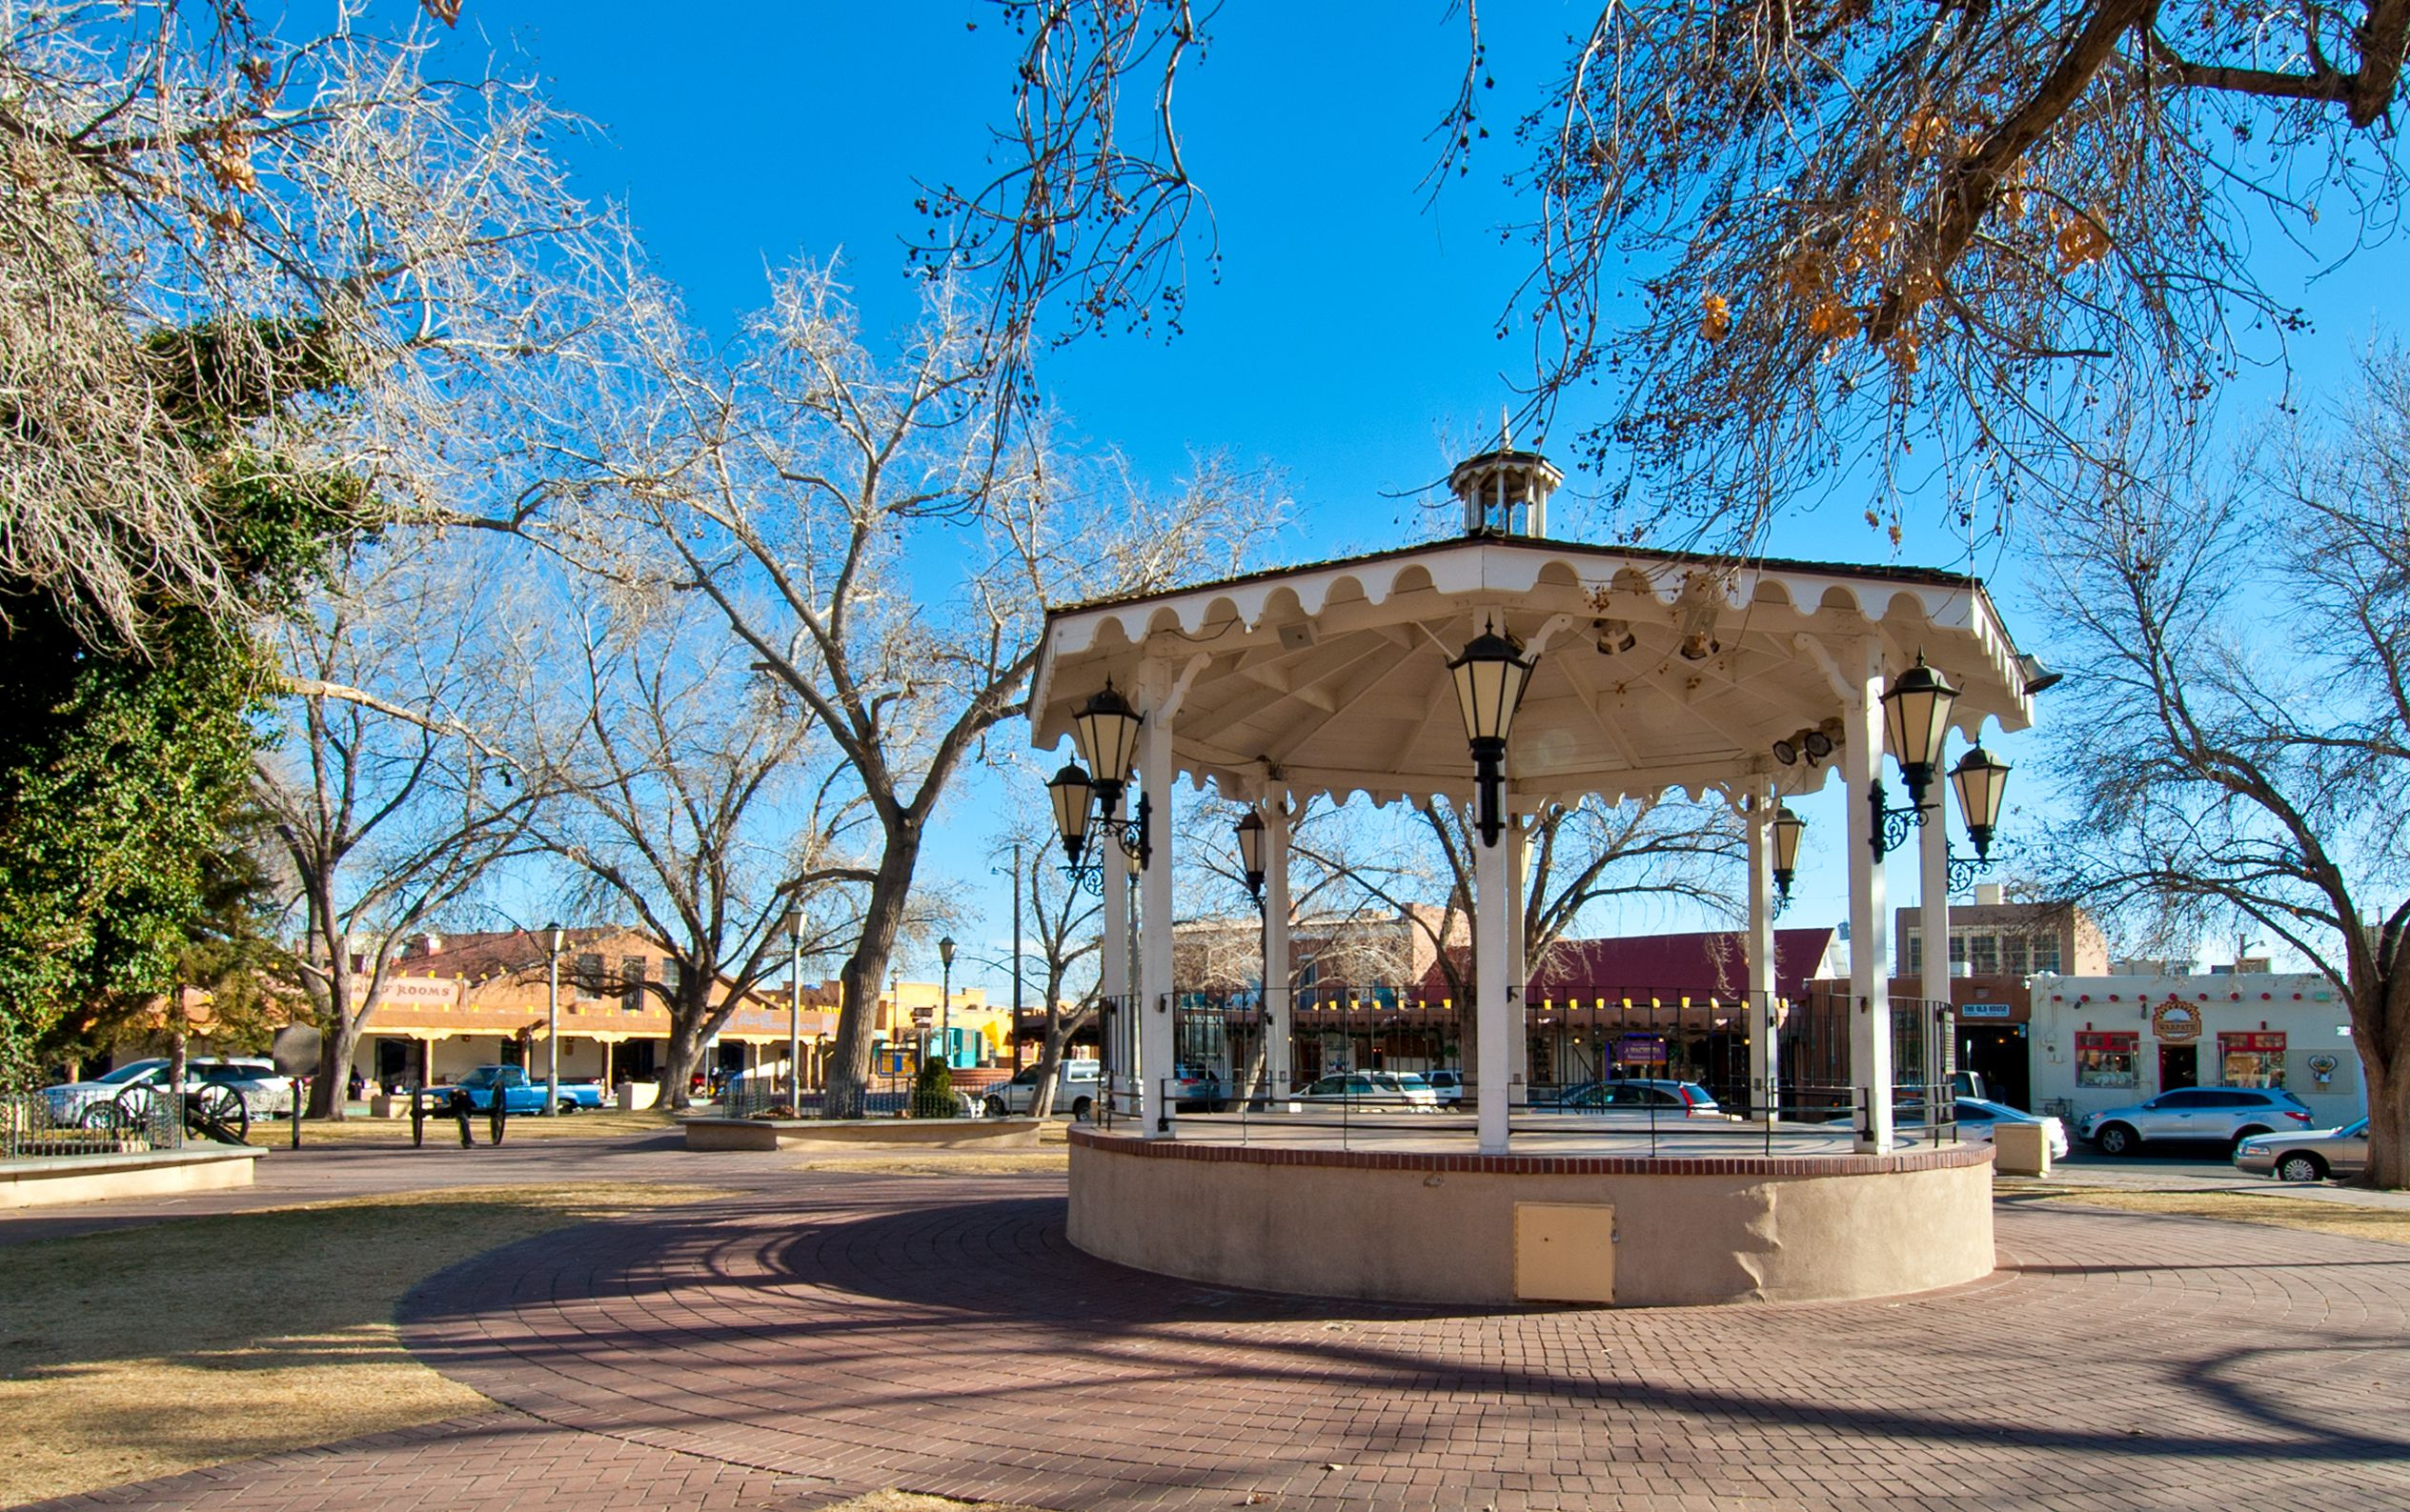 Wood Gazebo in Old Town, Albuquerque